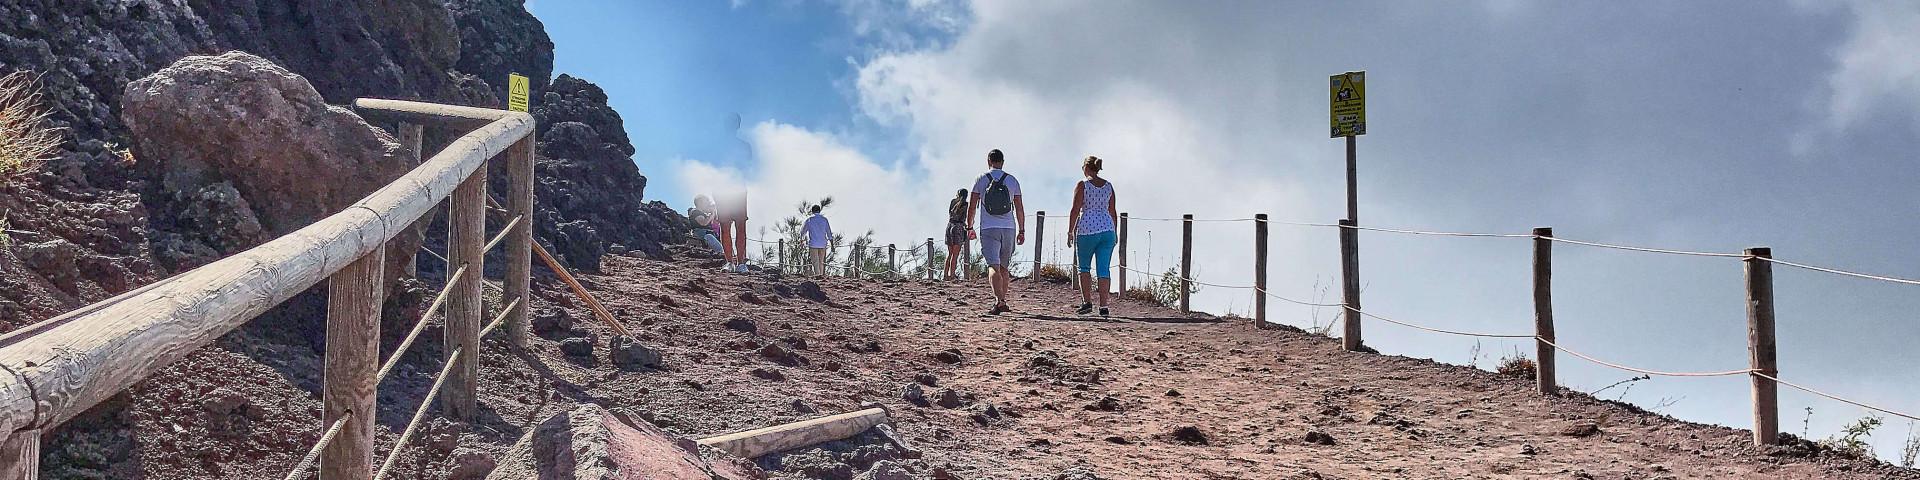 Walk around the rim of the Vesuvius volcano crater